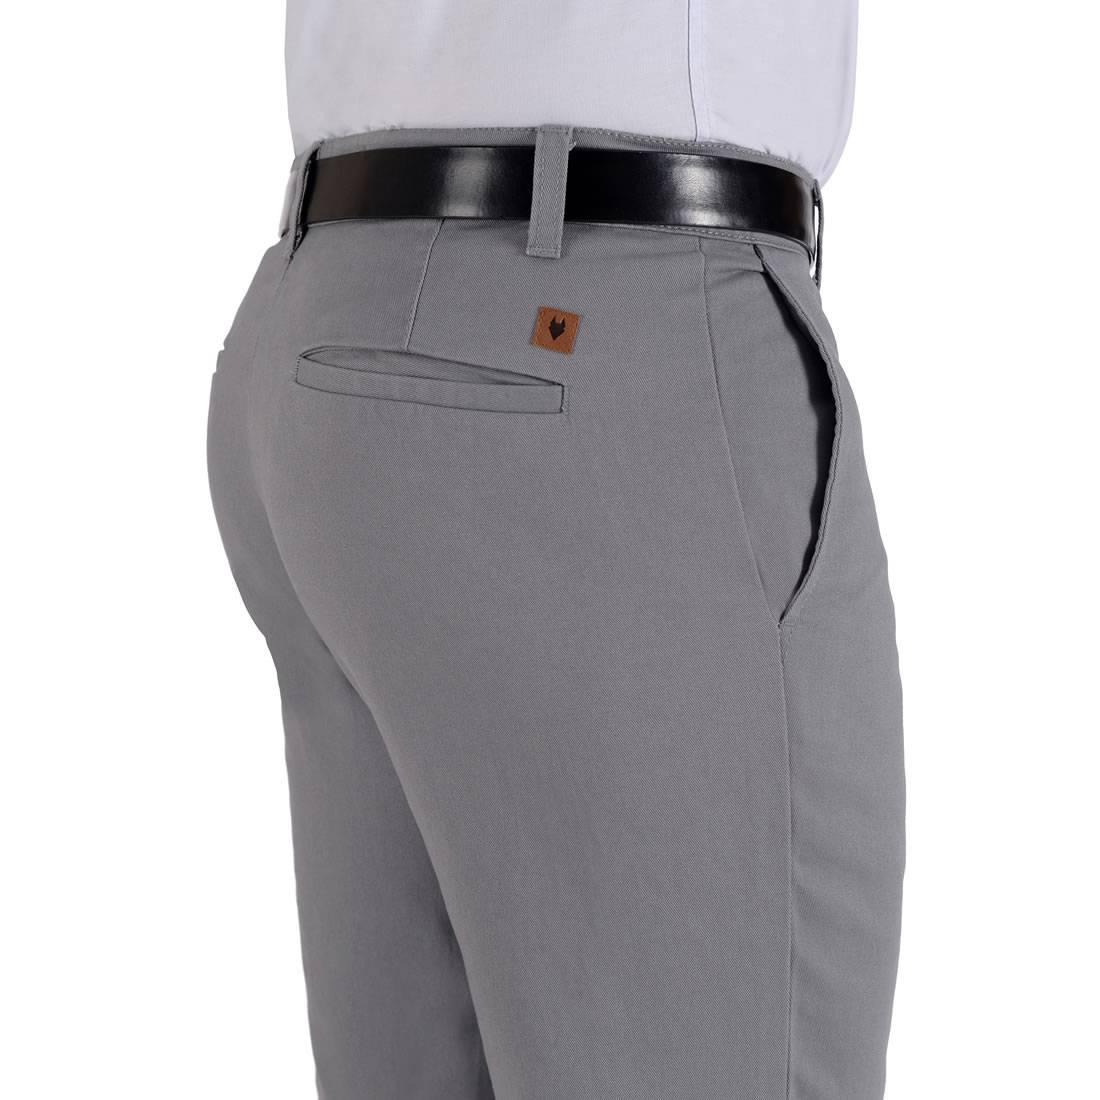 010811074406-04-Pantalon-Casual-Sin-Pinzas-Classic-Fit-Gris-yale